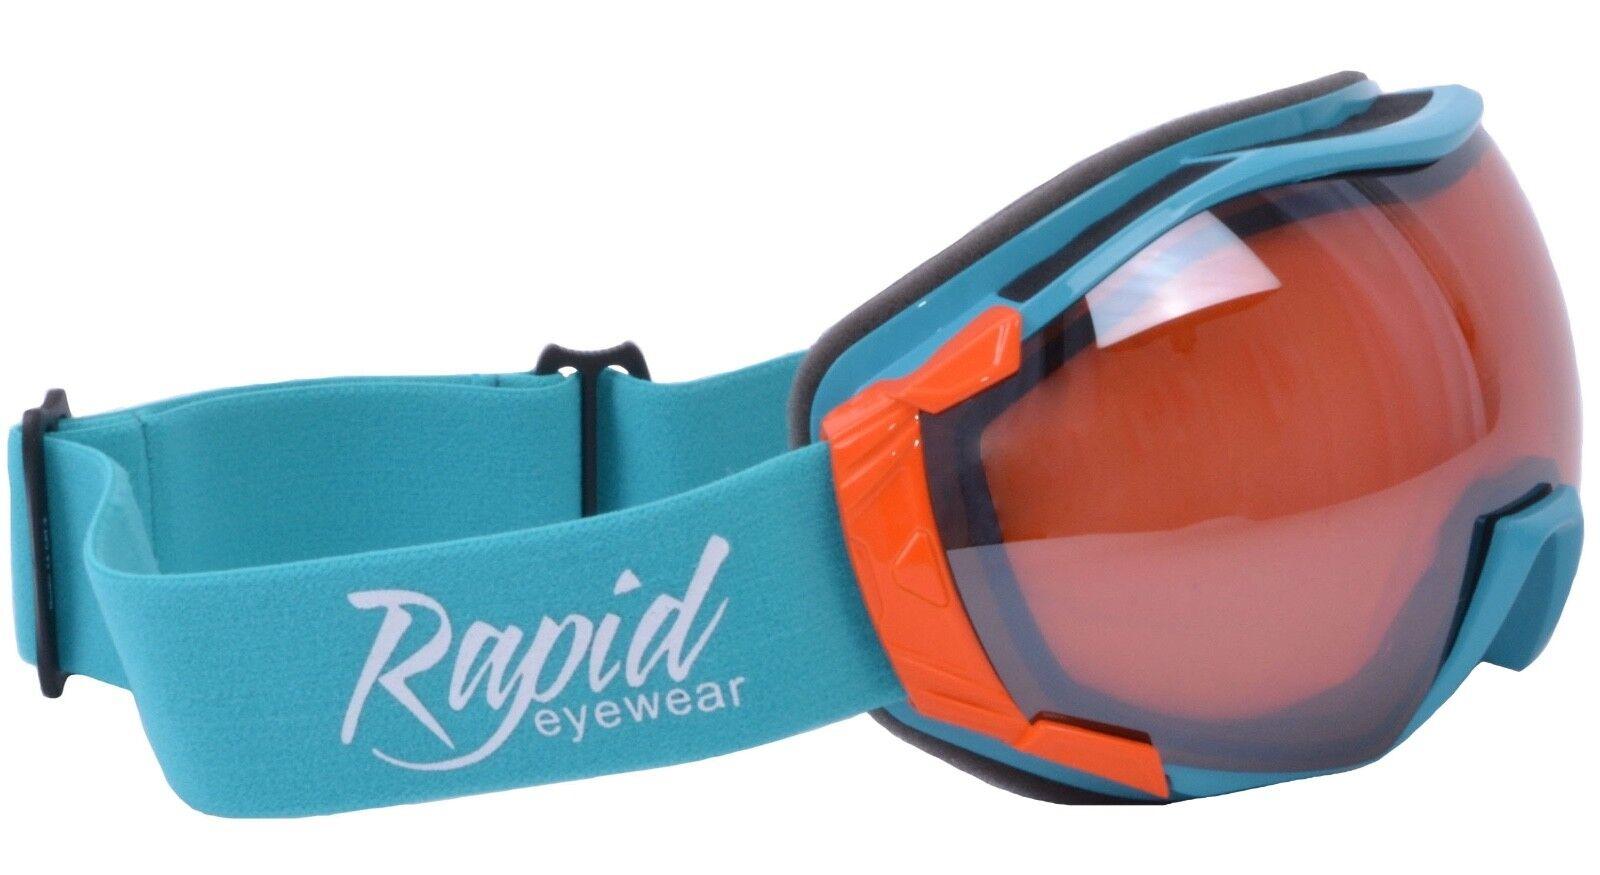 SNOW GOGGLES For Skiing & Snowboarding  bluee. PRESCRIPTION OPTIONS. UV Mirror